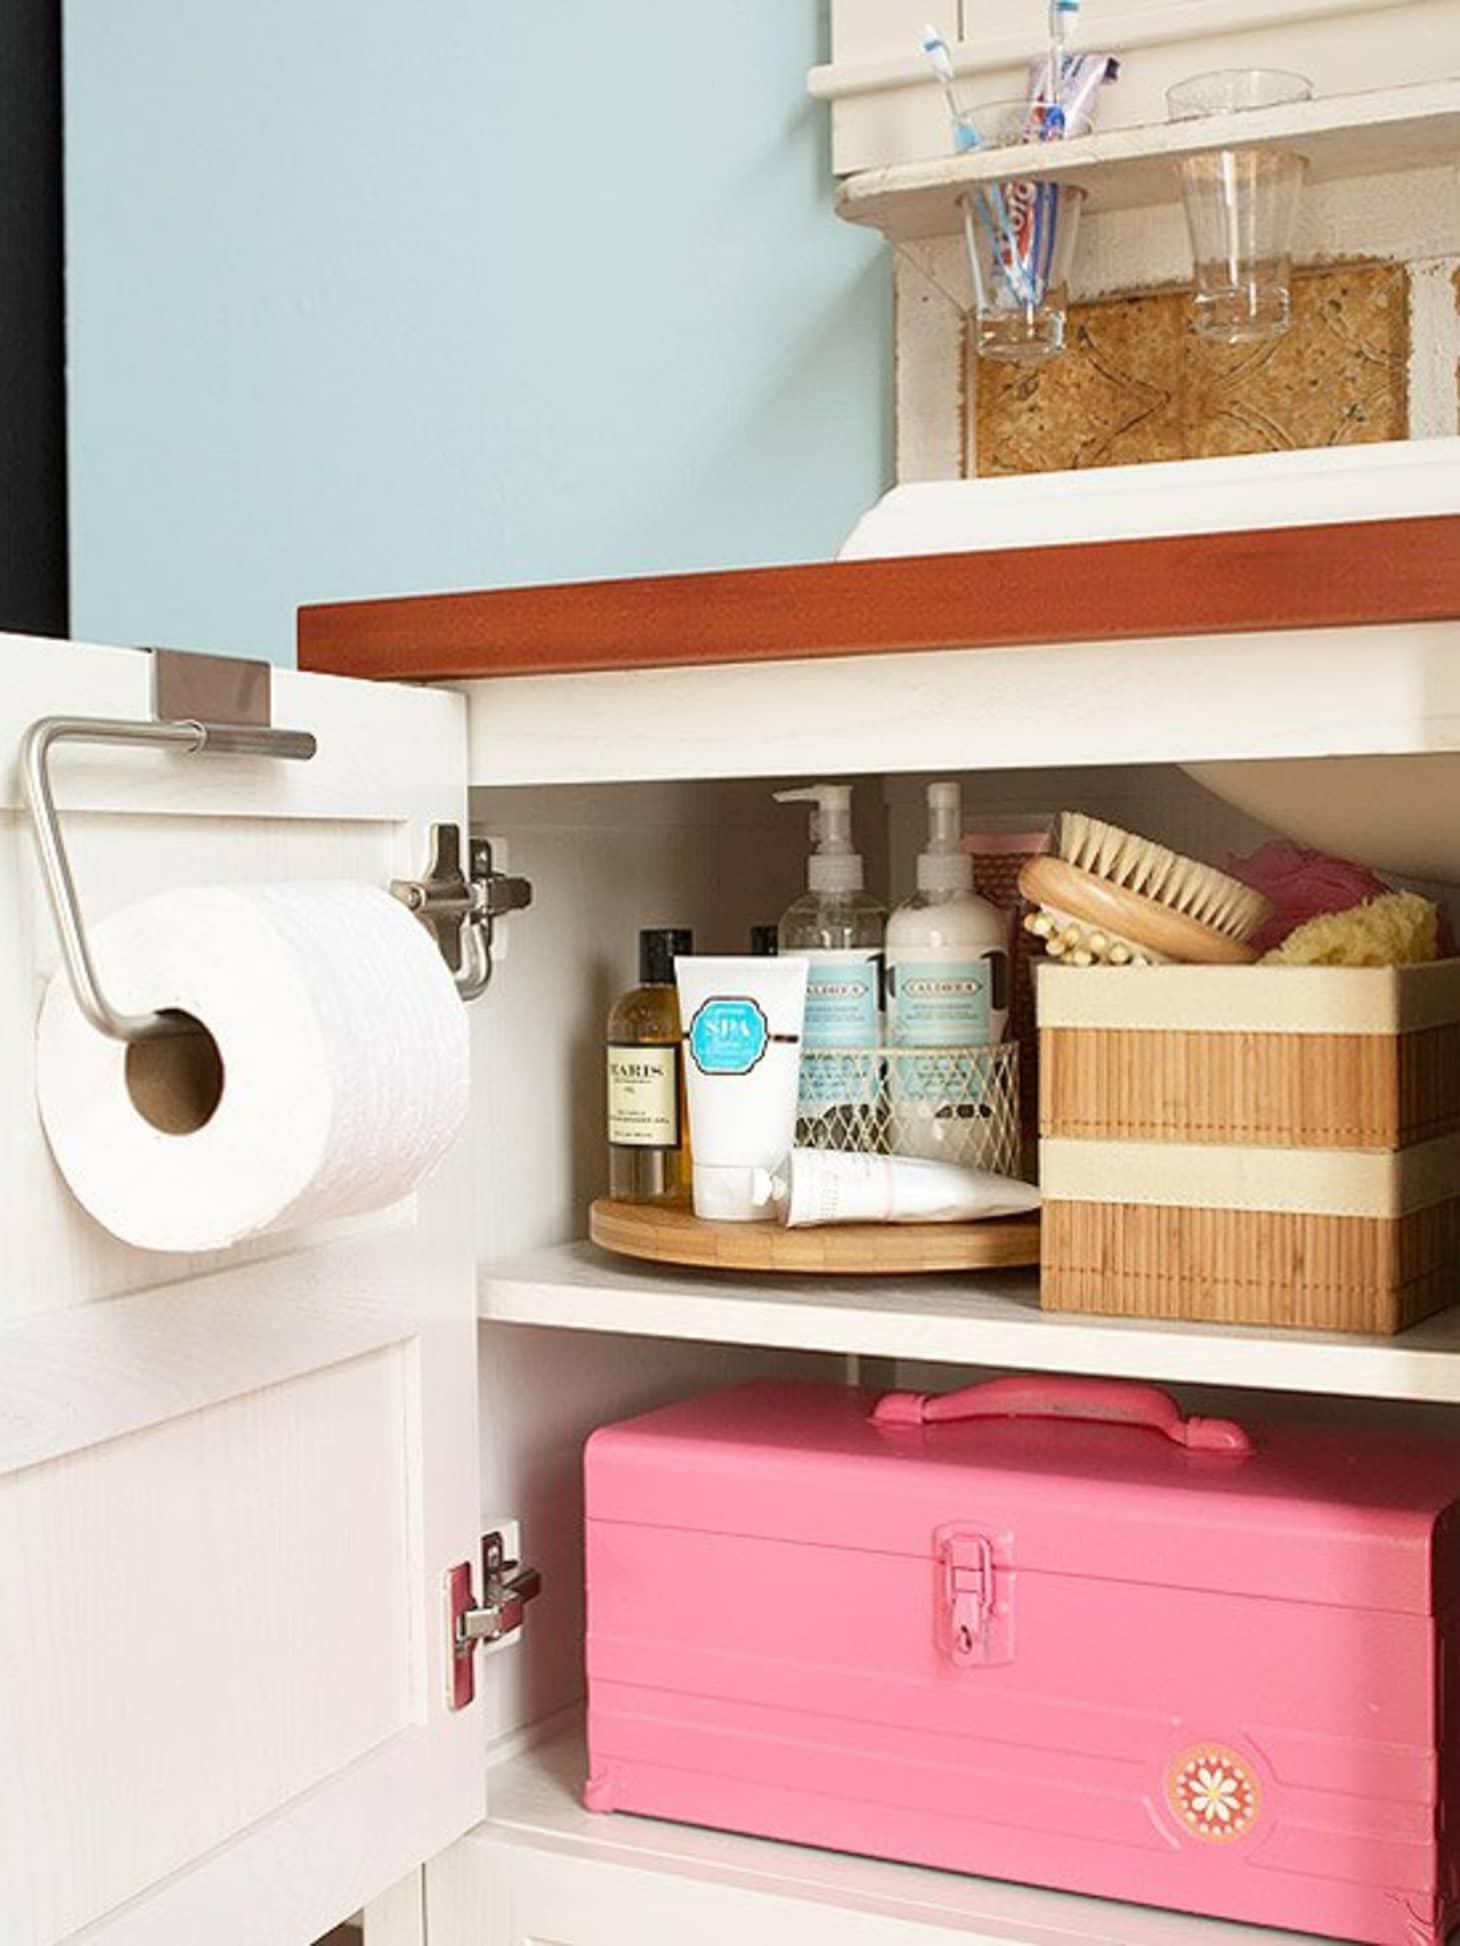 Bathroom Storage Ideas - Storage For Small Bathrooms ... on Small Apartment Bathroom Storage Ideas  id=48095